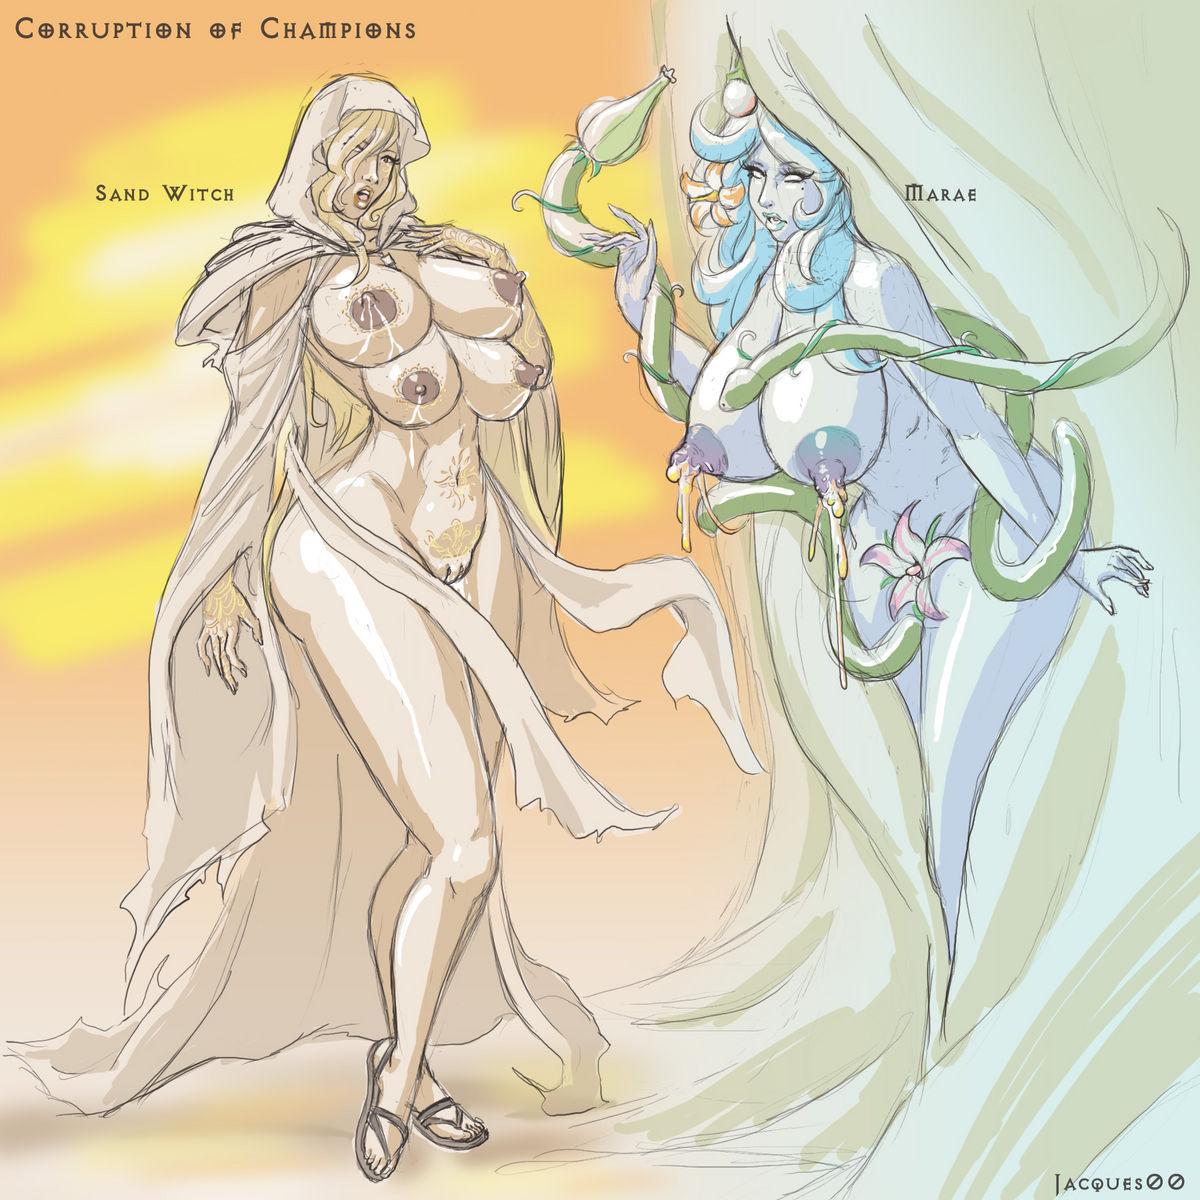 corruption debug of cheats champions Kalias divinity original sin 2